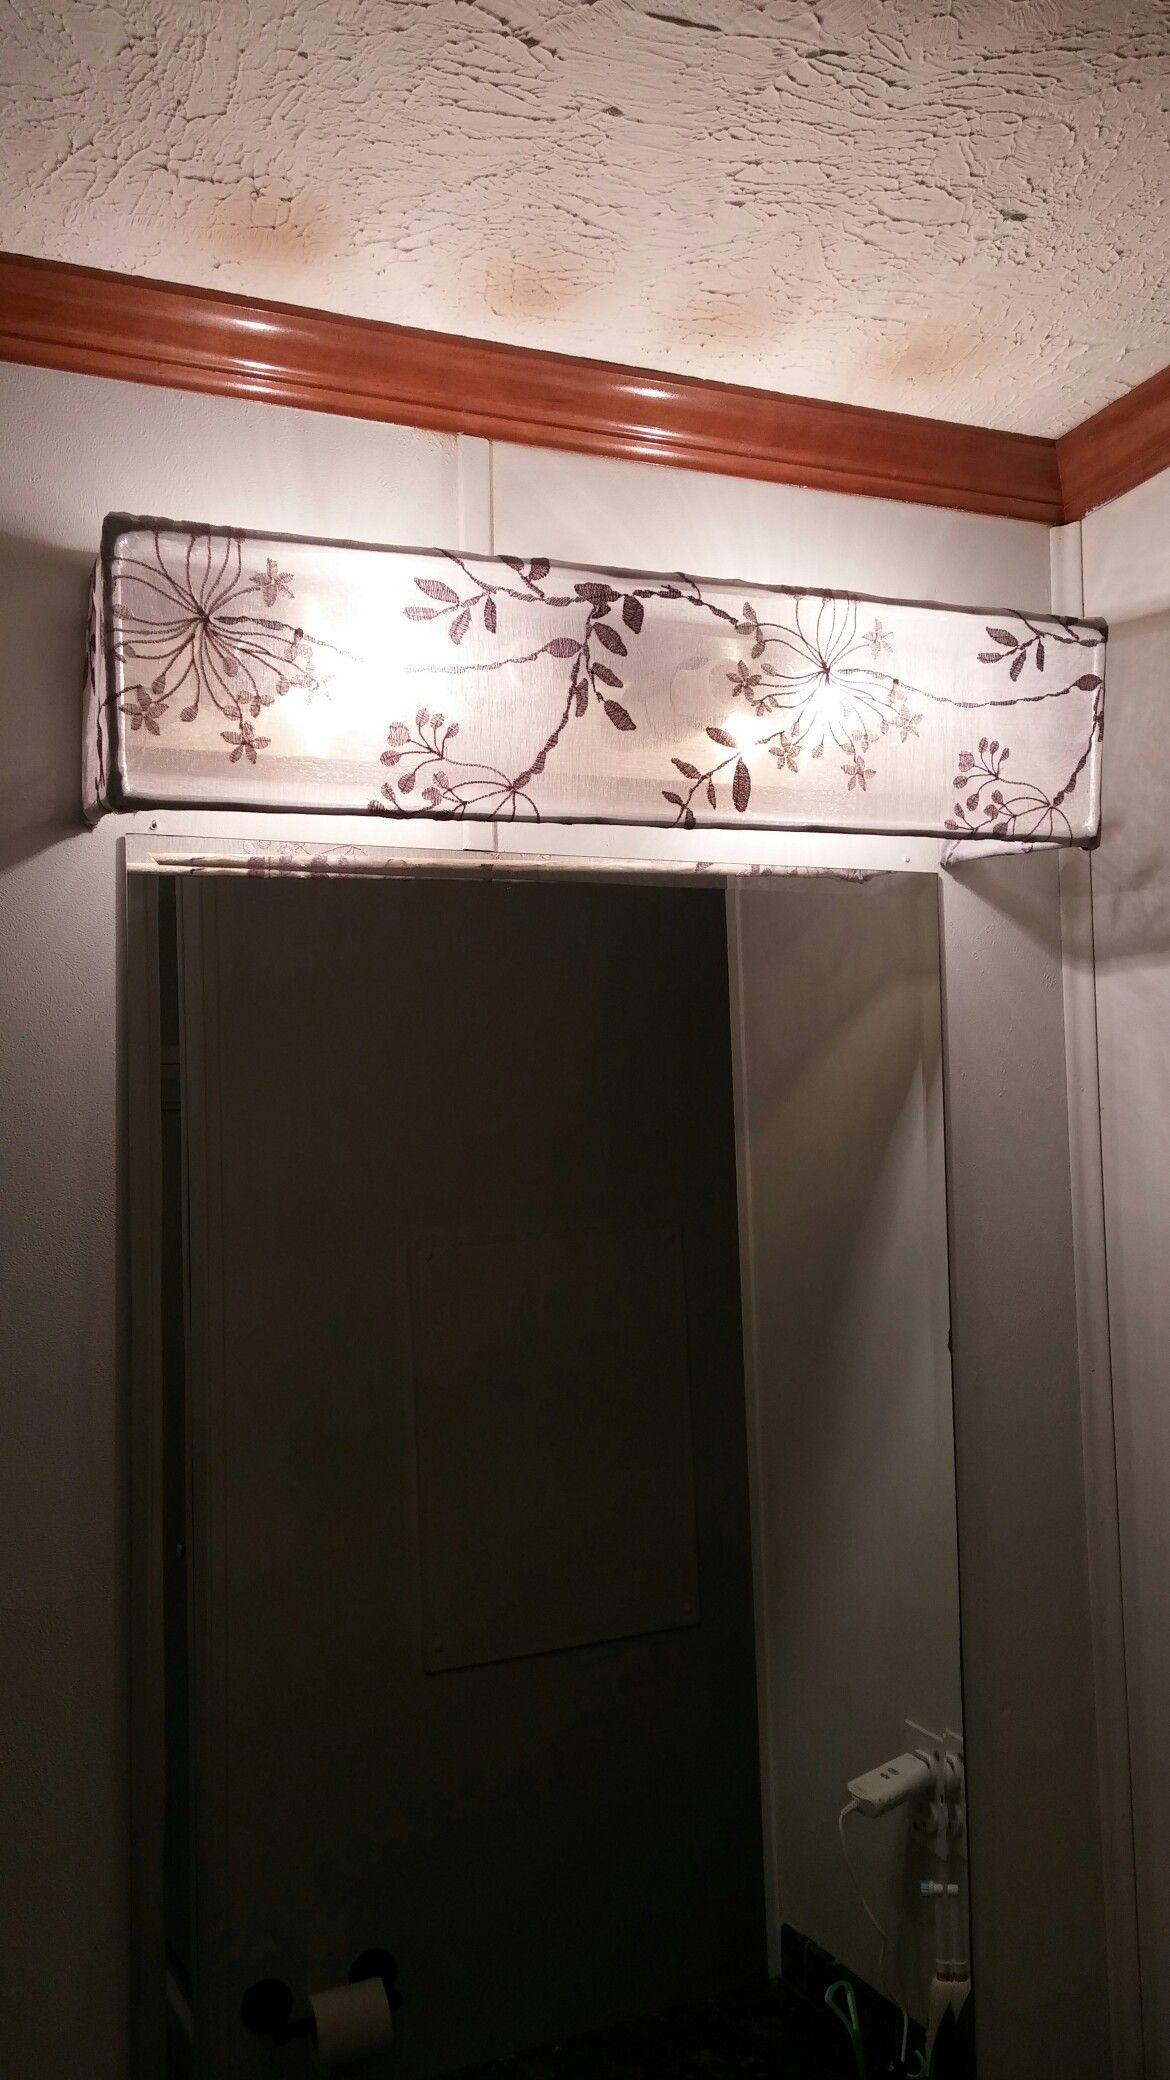 Bathroom Vanity Lights With Fabric Shades diy vanity light shade dowel rods and a curtain sheer hot glued